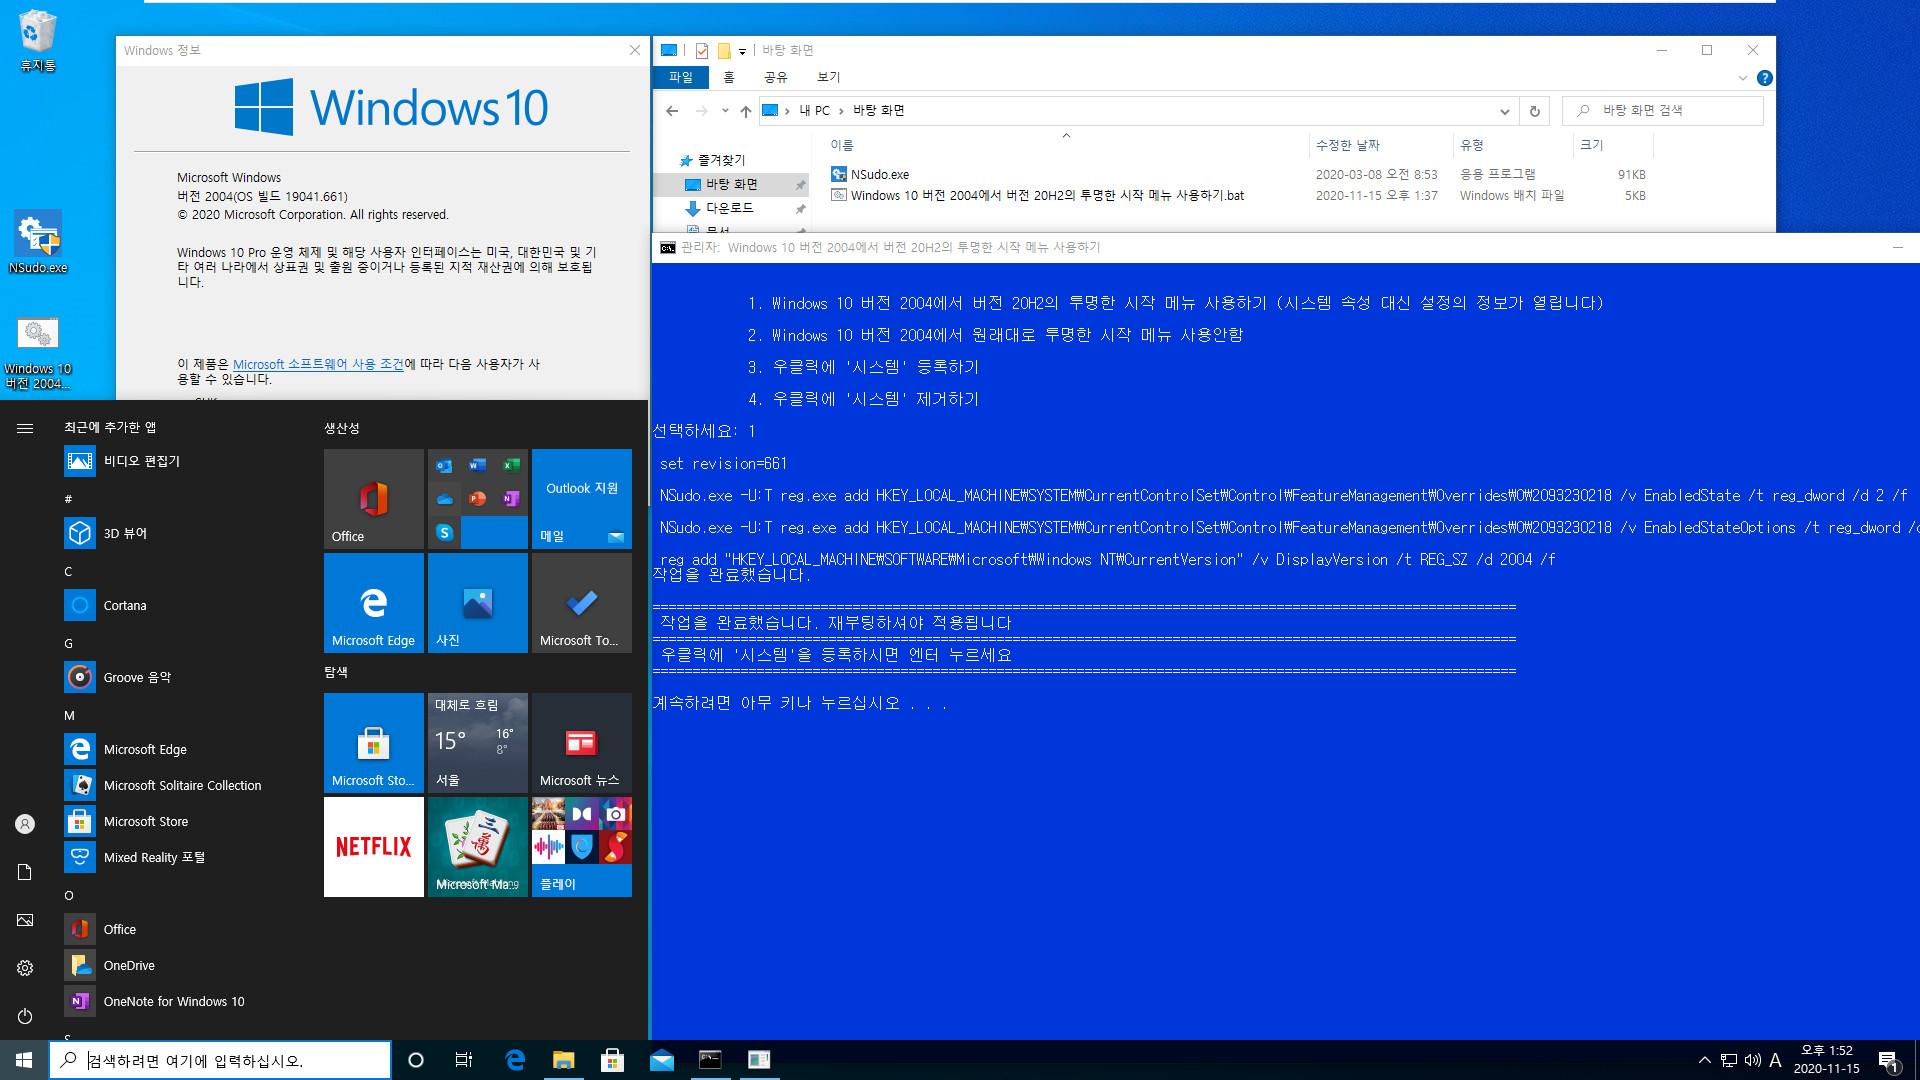 Windows 10 버전 2004에서 버전 20H2의 투명한 시작 메뉴 사용하기.bat 테스트 2020-11-15_135235.jpg